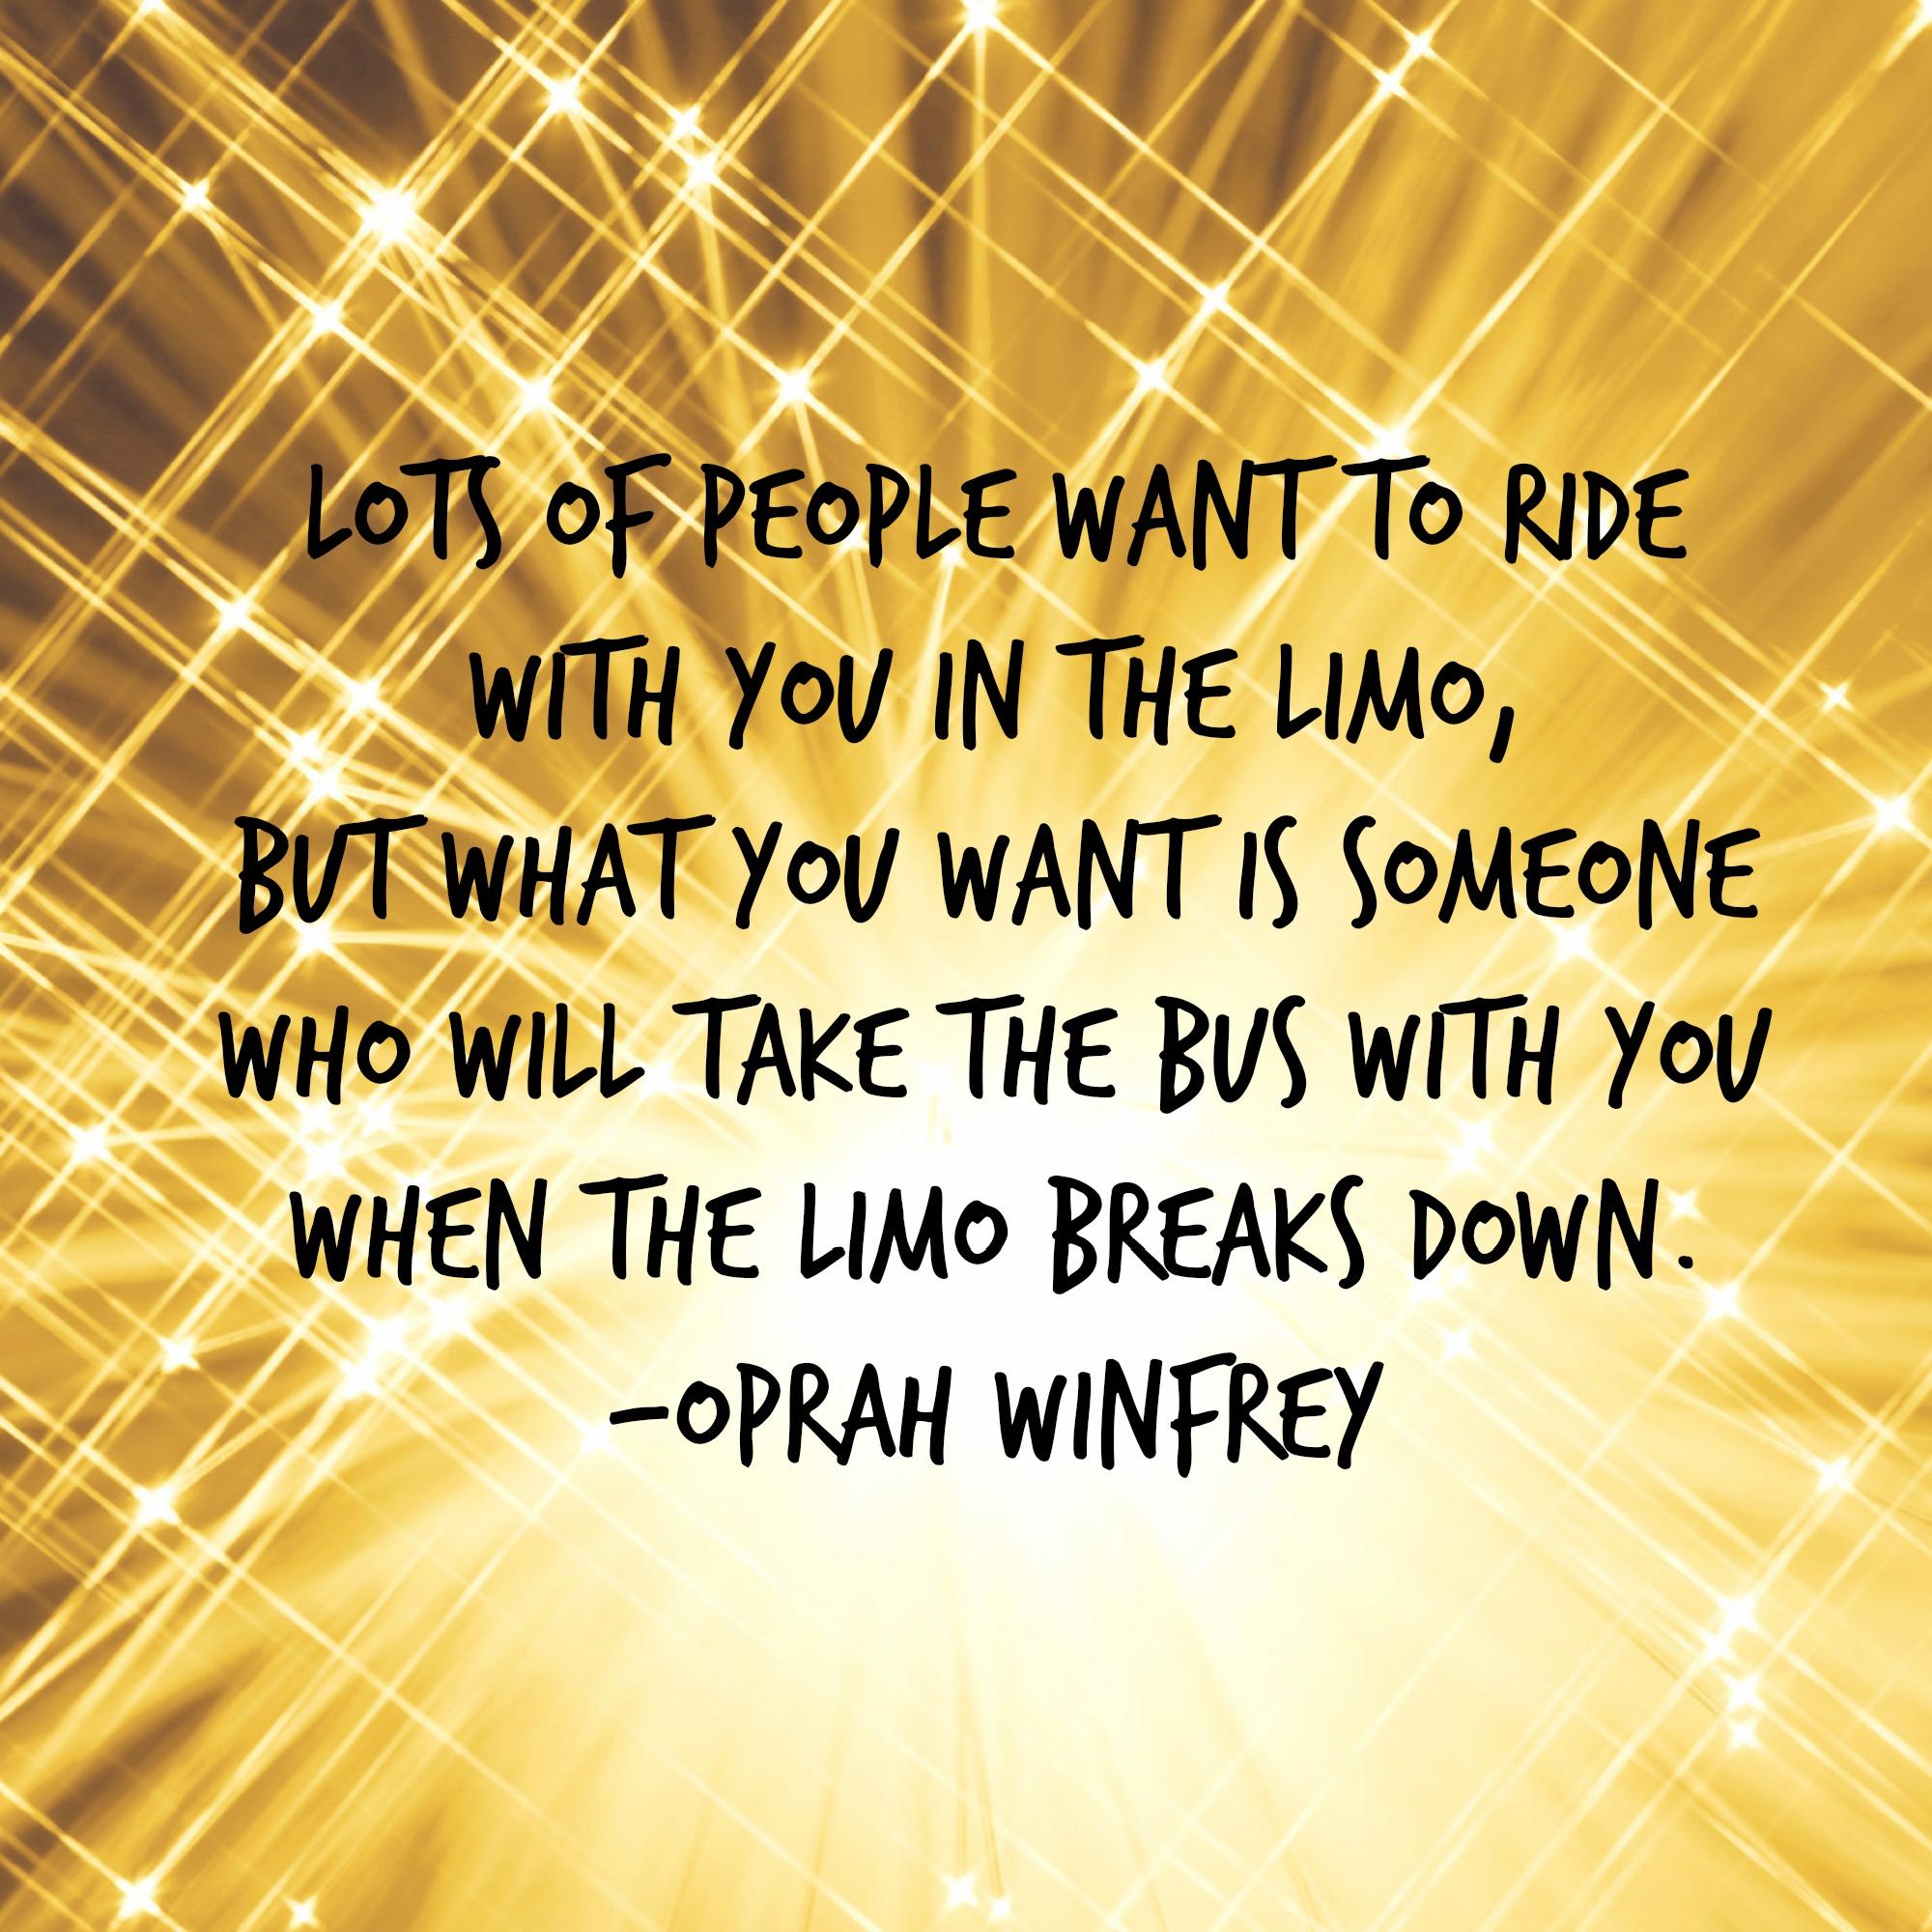 Oprah Winfrey New Year Quotes: Friendship Quotes By Oprah Winfrey. QuotesGram